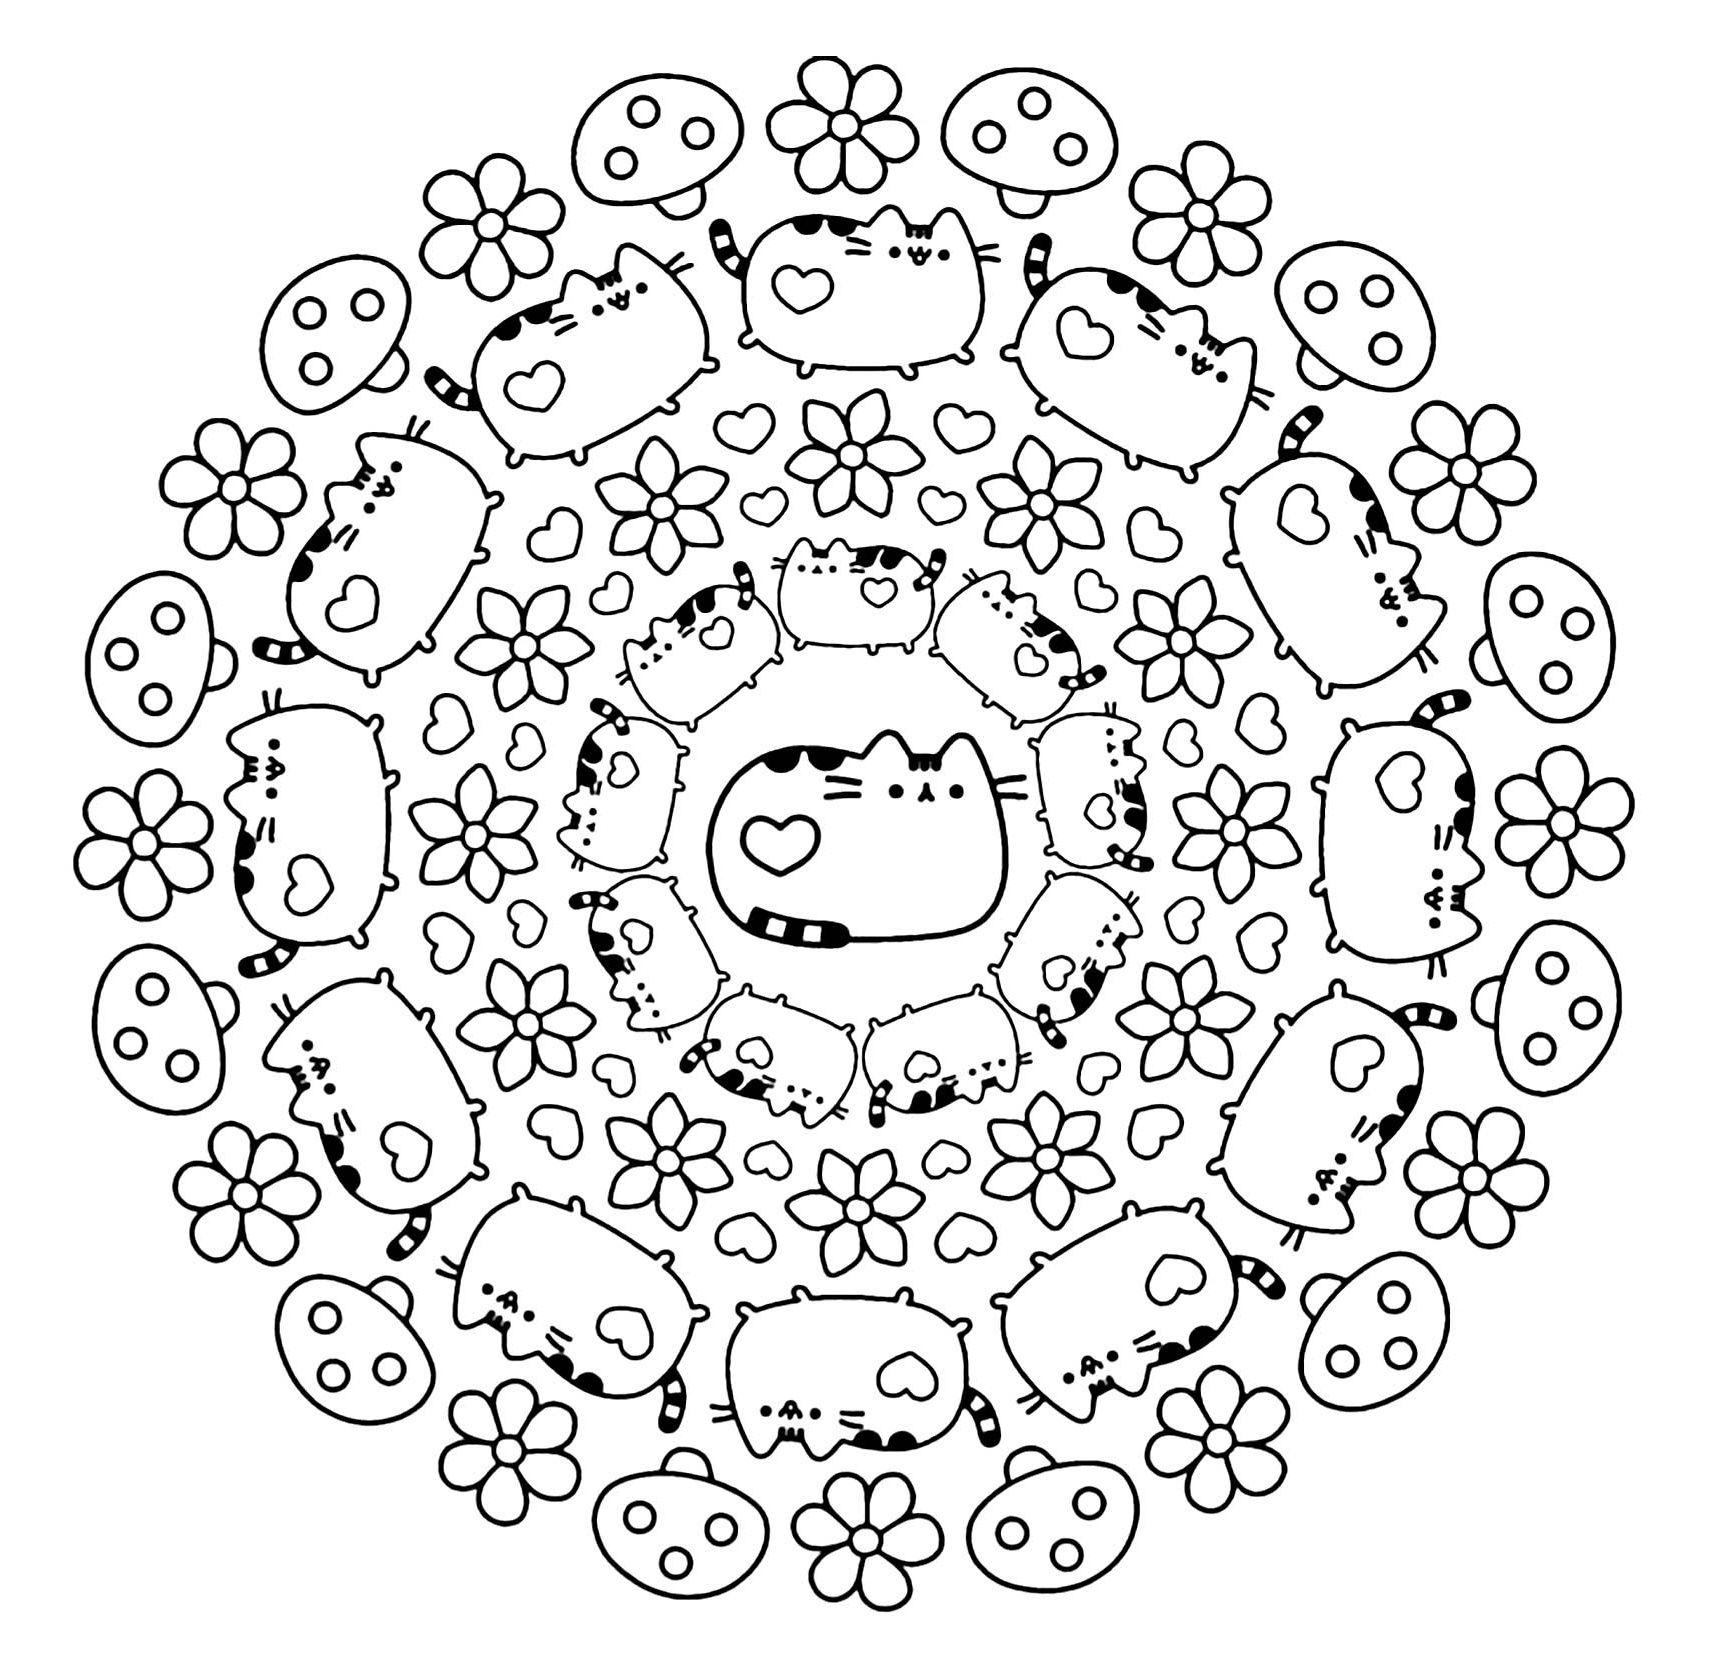 12 Limitee Coloriage Kawaii Chat Images Kleurplaten Tekenen